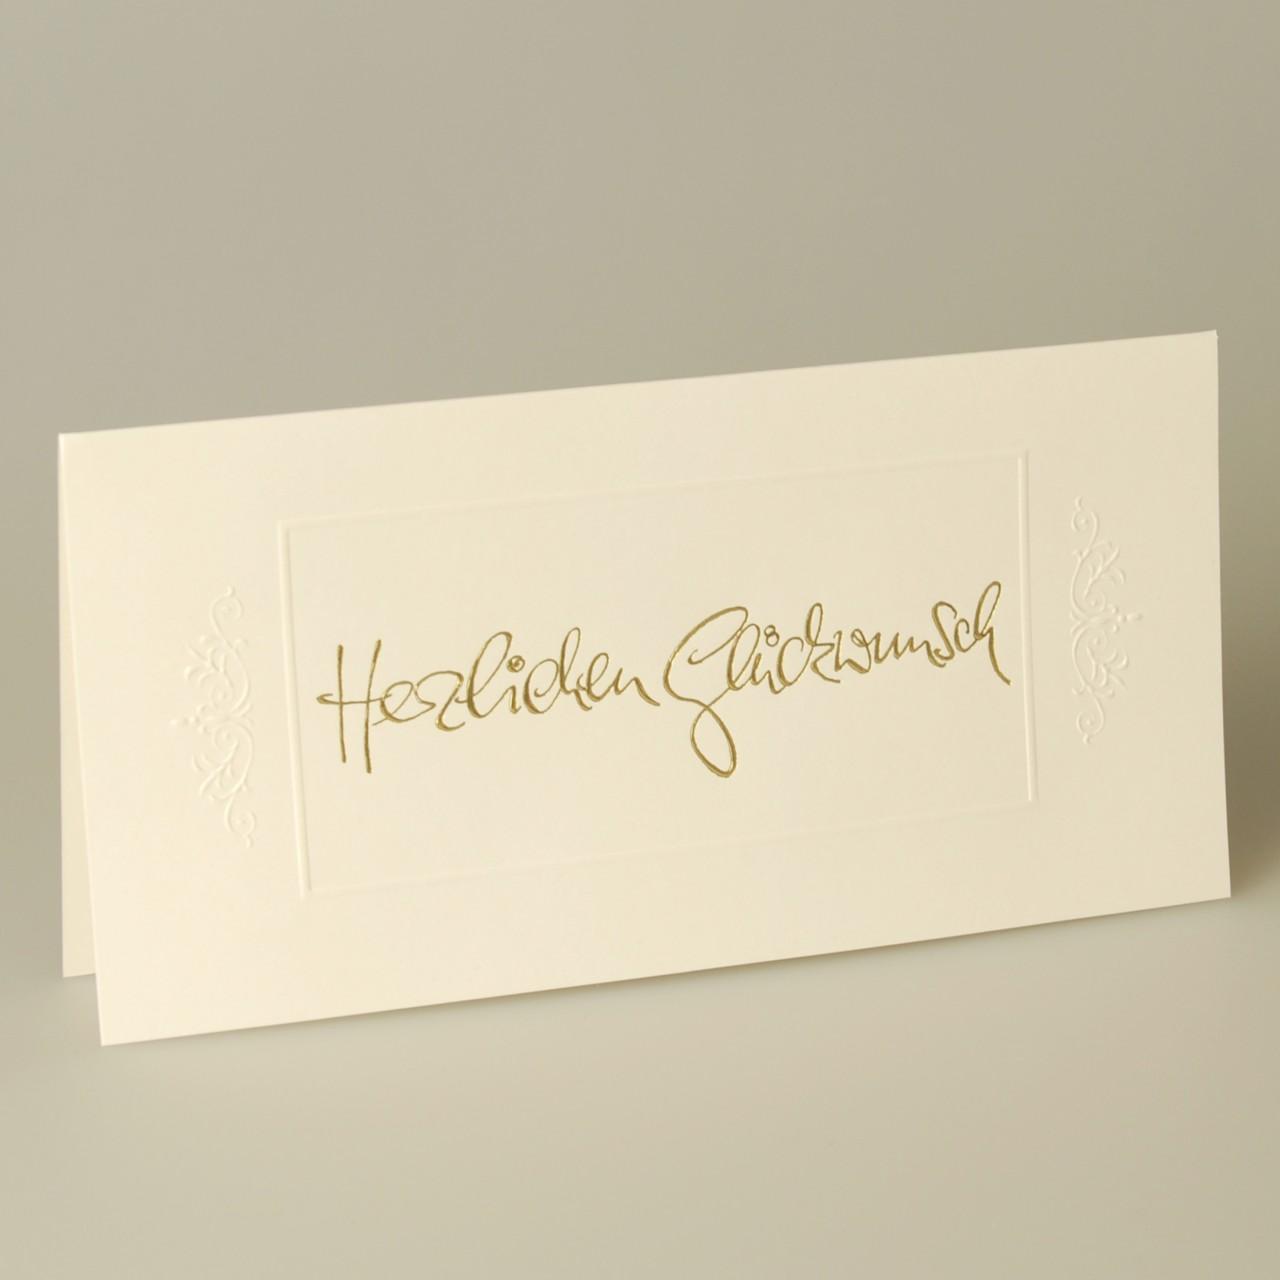 Glückwunschkarte - A 3808